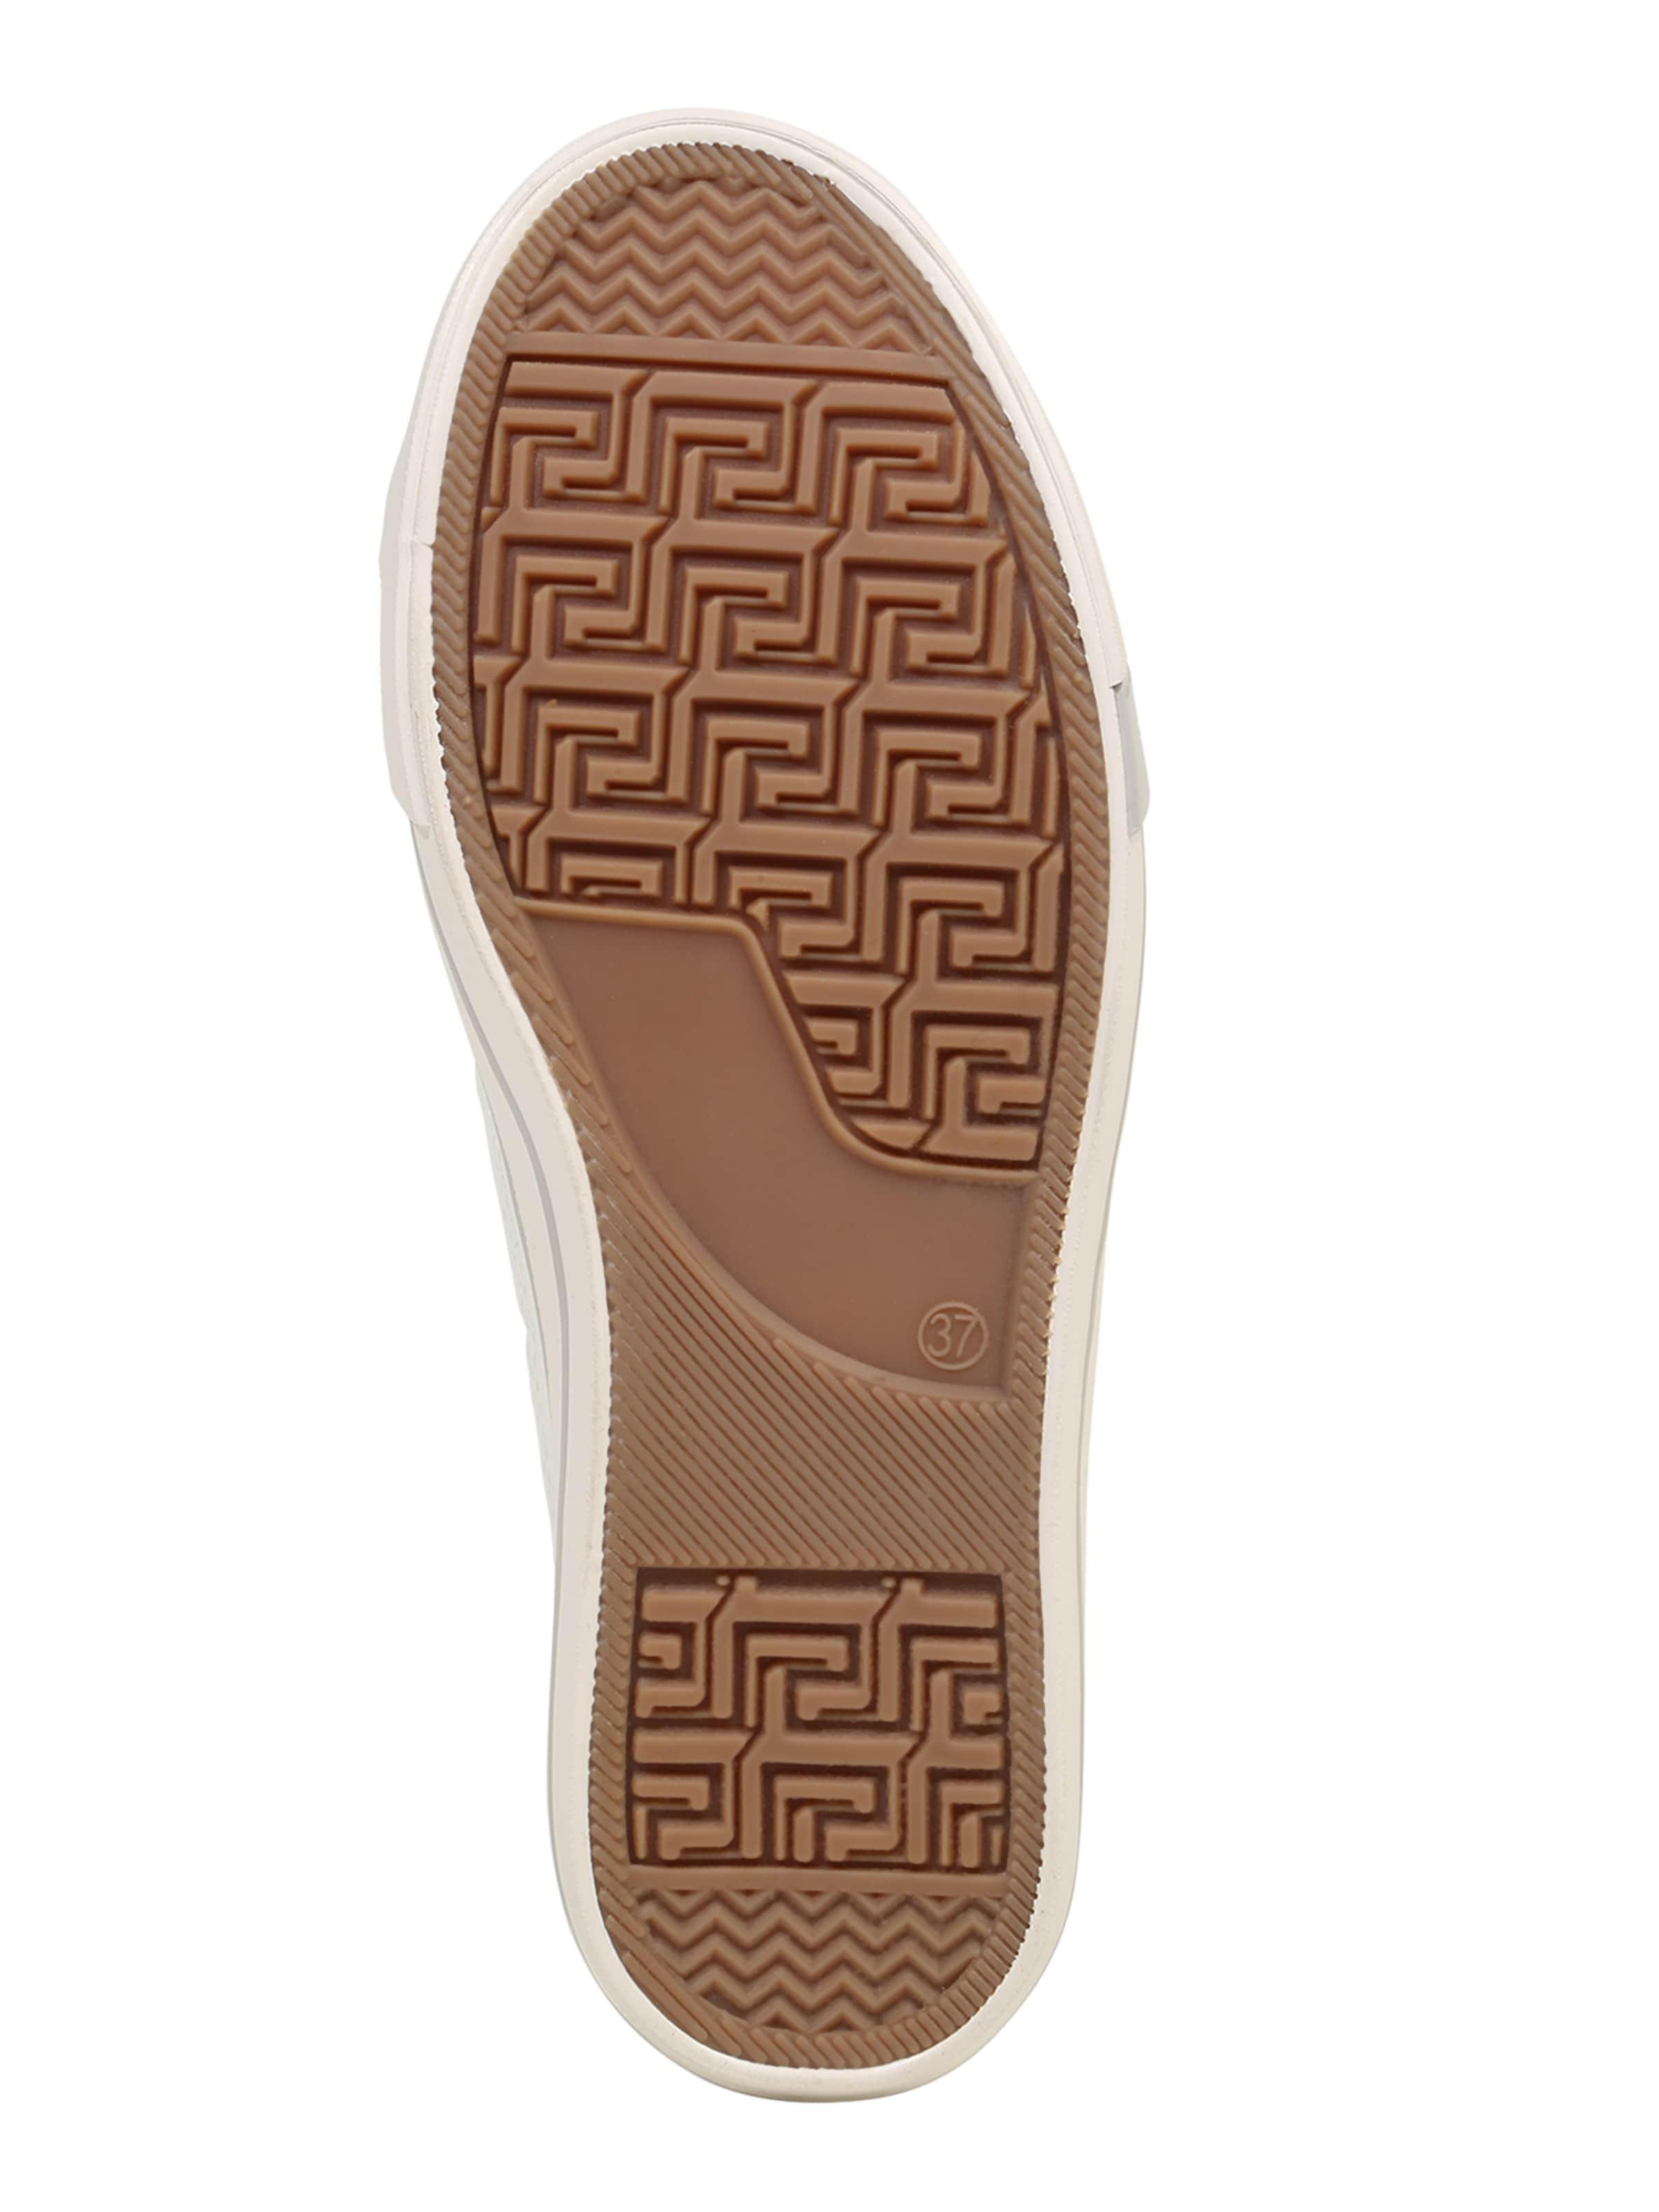 MUSTANG Sneaker 'Macrame' Marktfähig Rabatt Offiziell Marktfähig Billig Ausverkauf Store Billigste Online sqnvzyg31